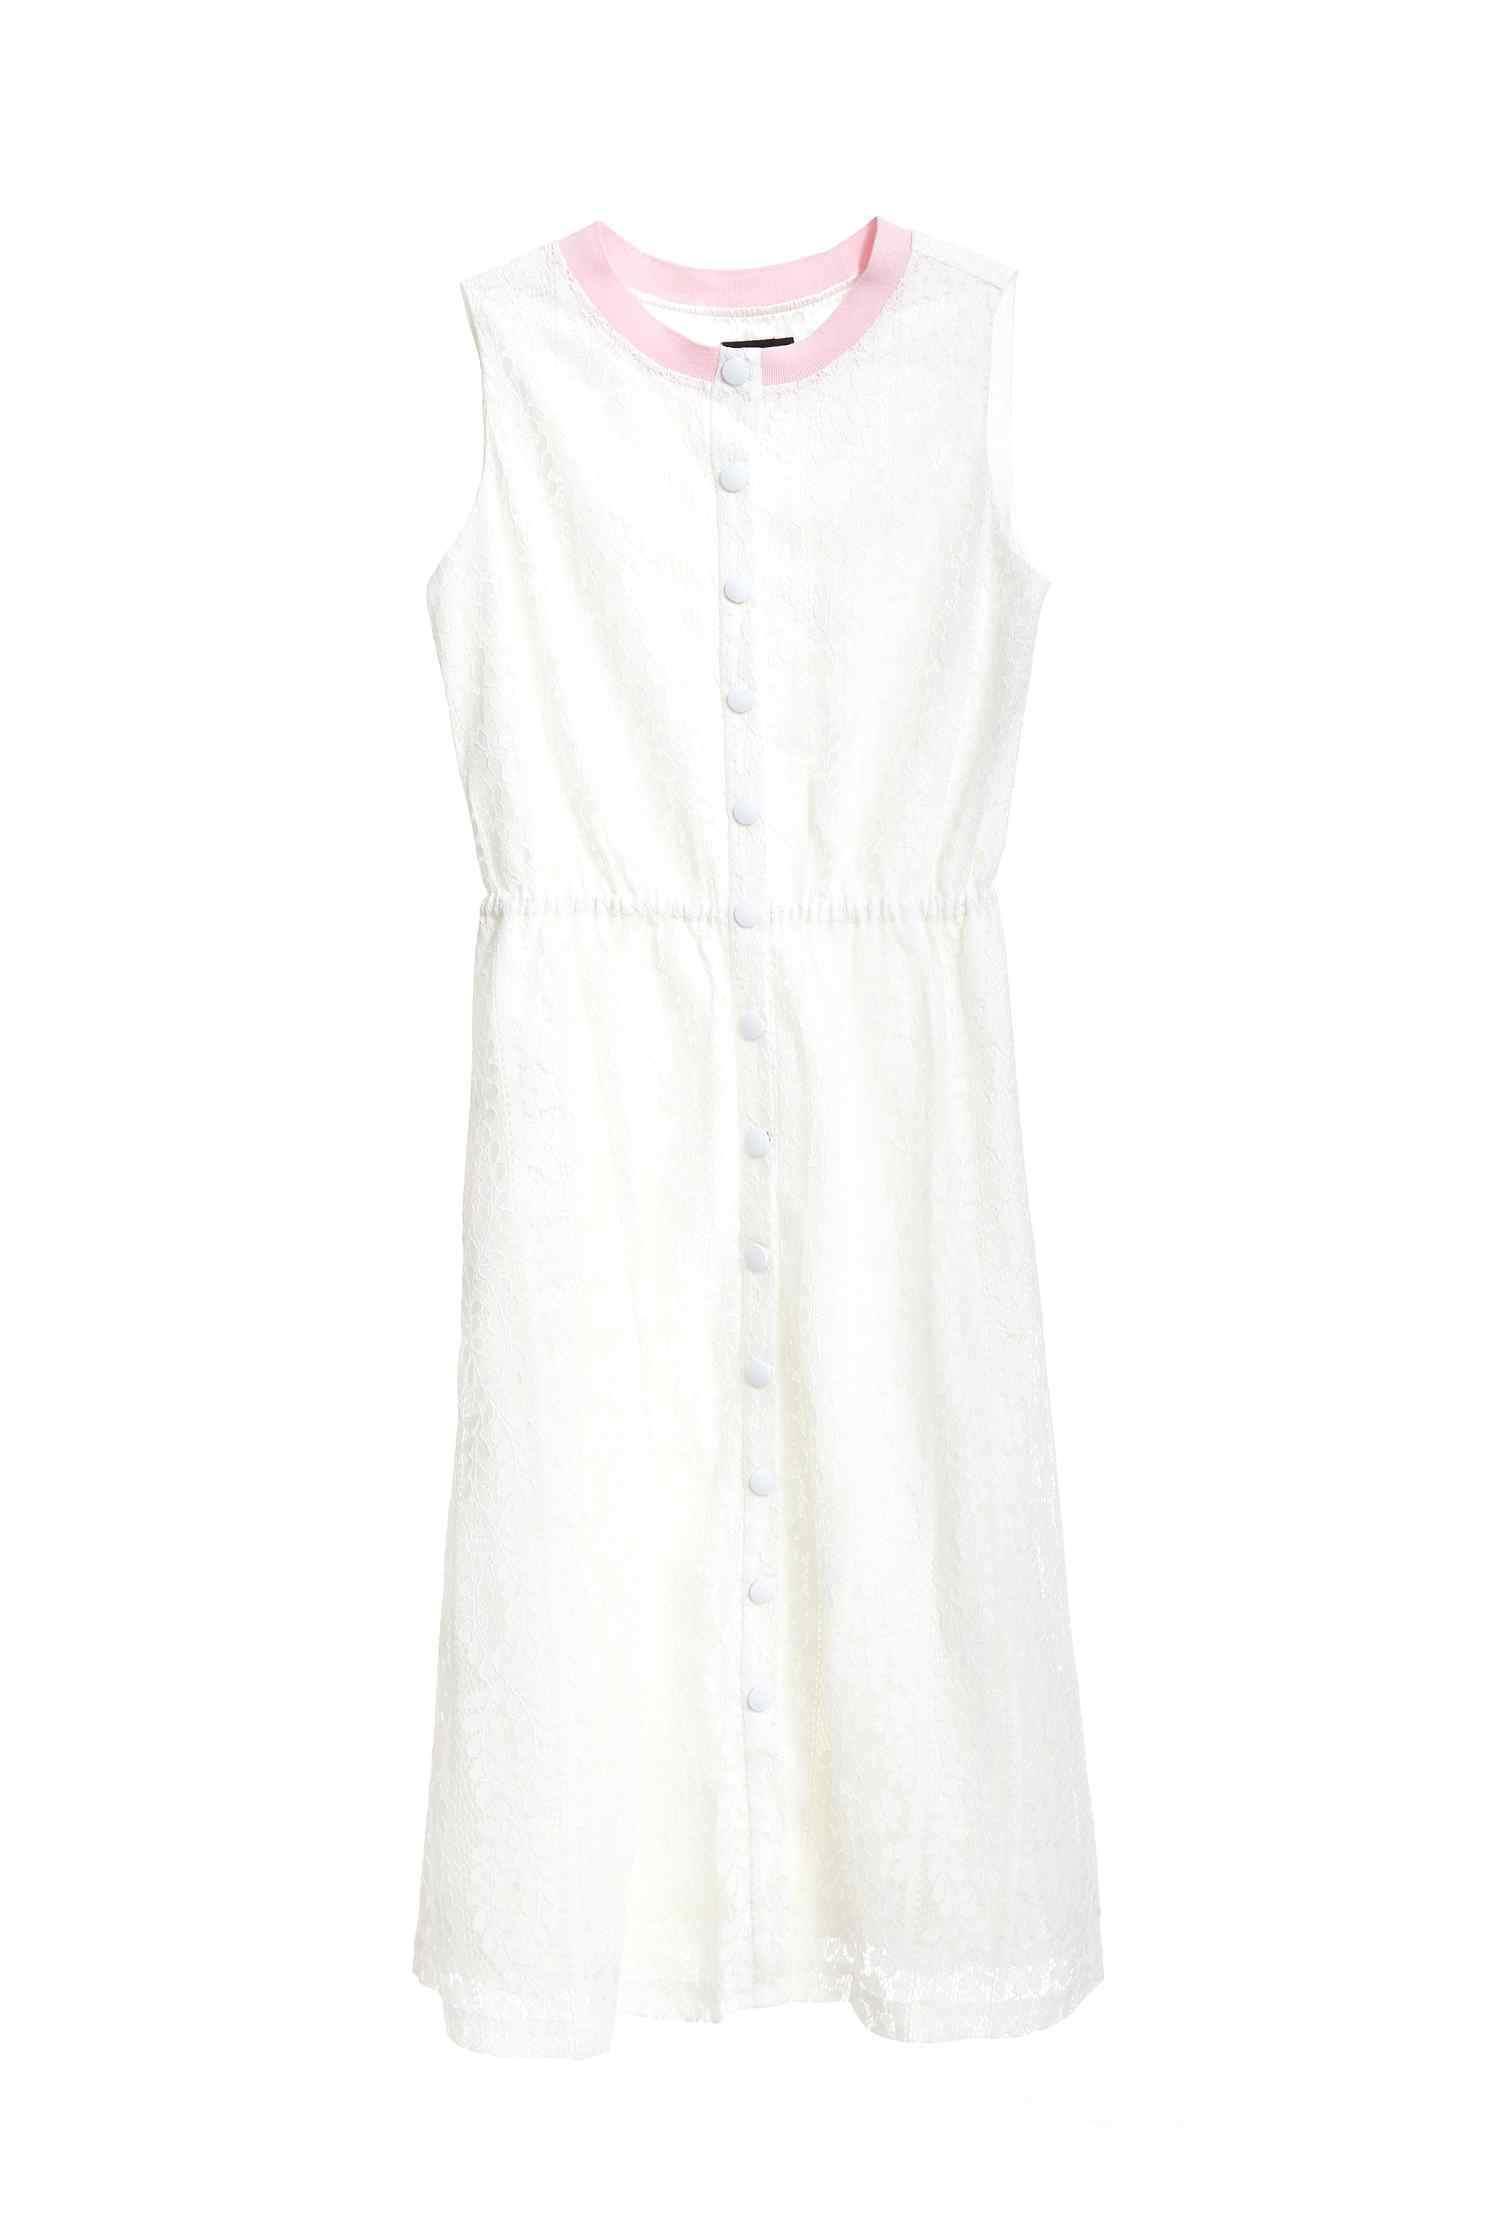 Full lace classic dress,cocktaildress,firesigns,sleevelessdress,whitedress,valentine,i-select,lace,lacedress